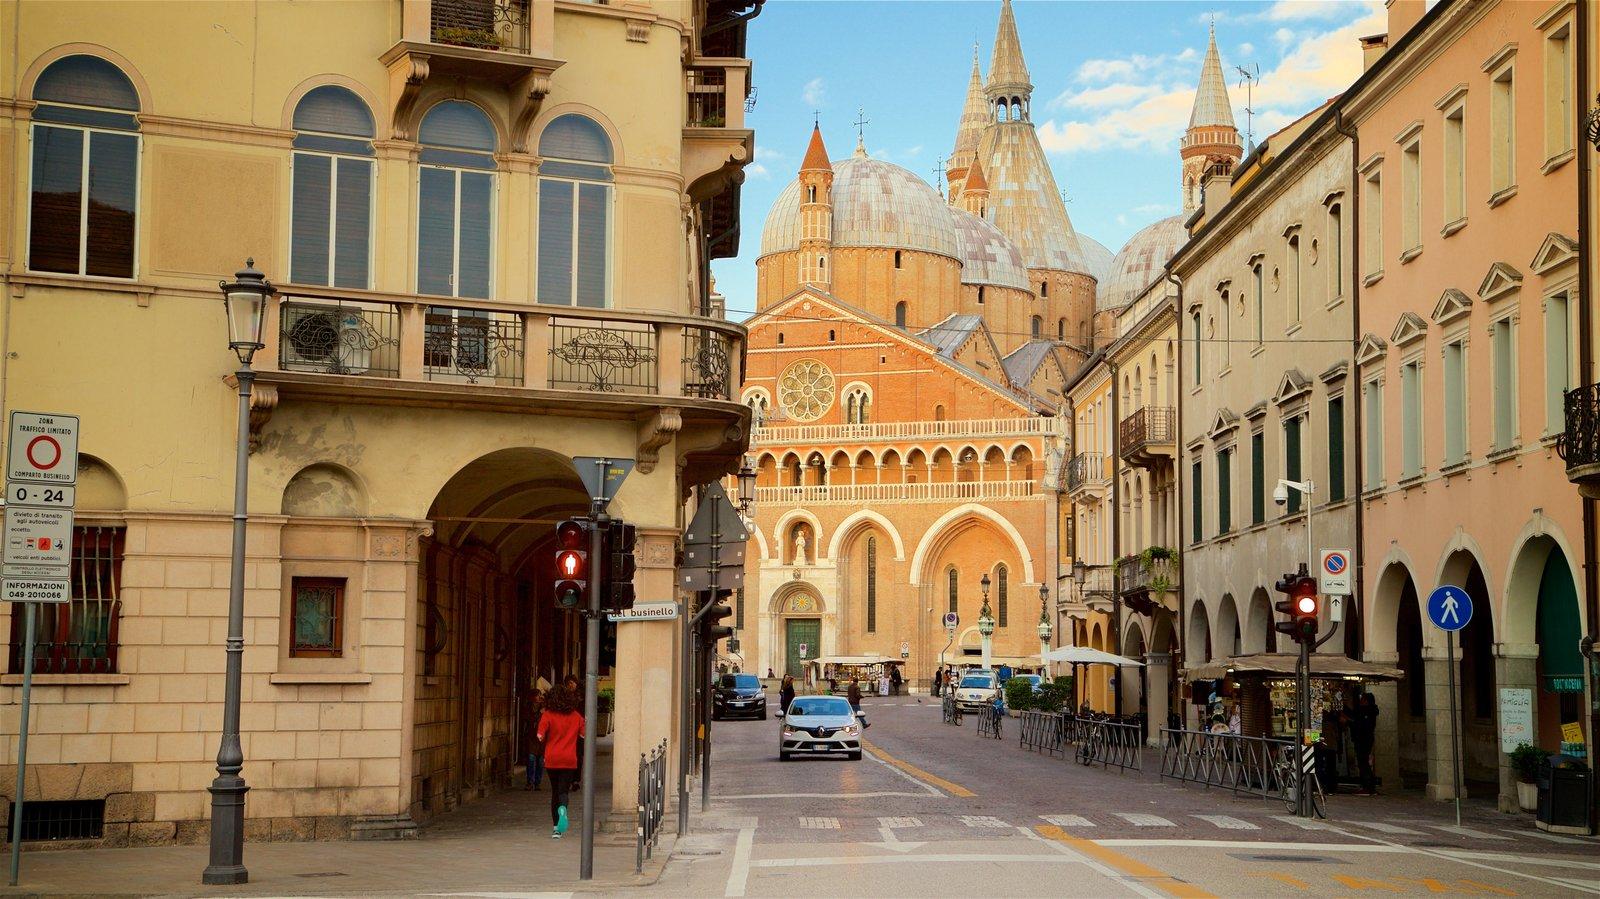 Basilica di Sant\'Antonio da Padova which includes a church or cathedral, heritage elements and a city